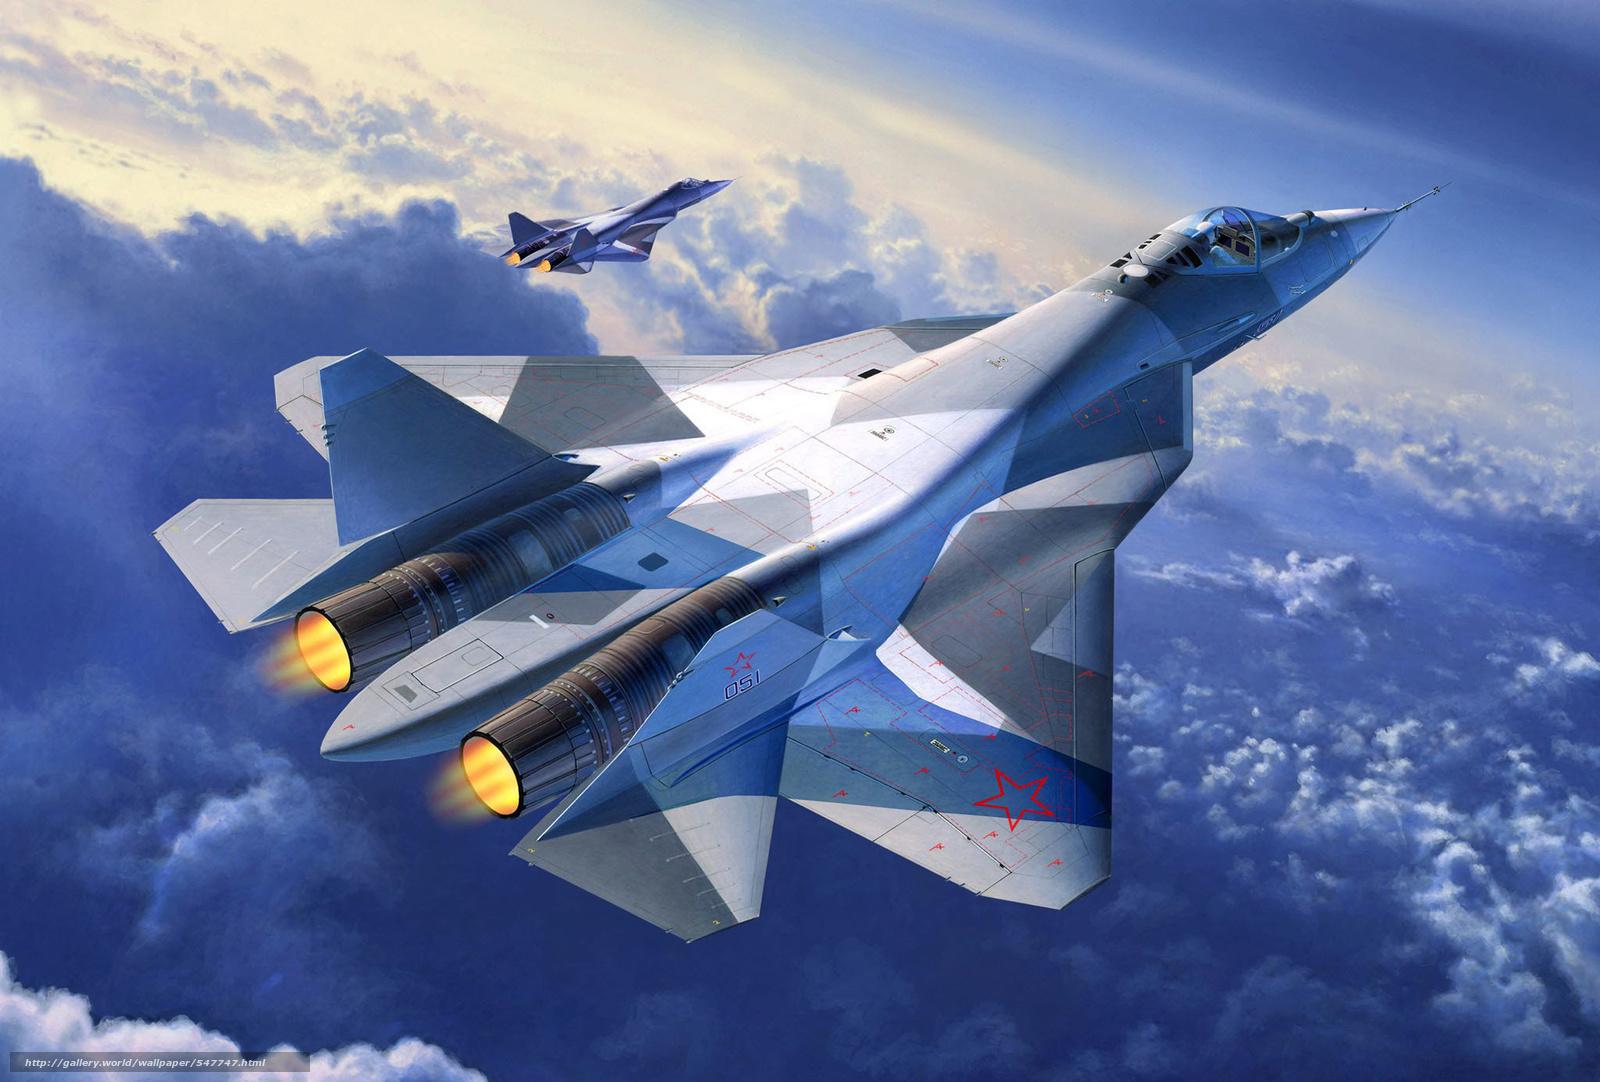 50 sukhoi t 50 pak fa wallpapers hd desktop and mobile backgrounds - Download Sukhoi T 50 Flying